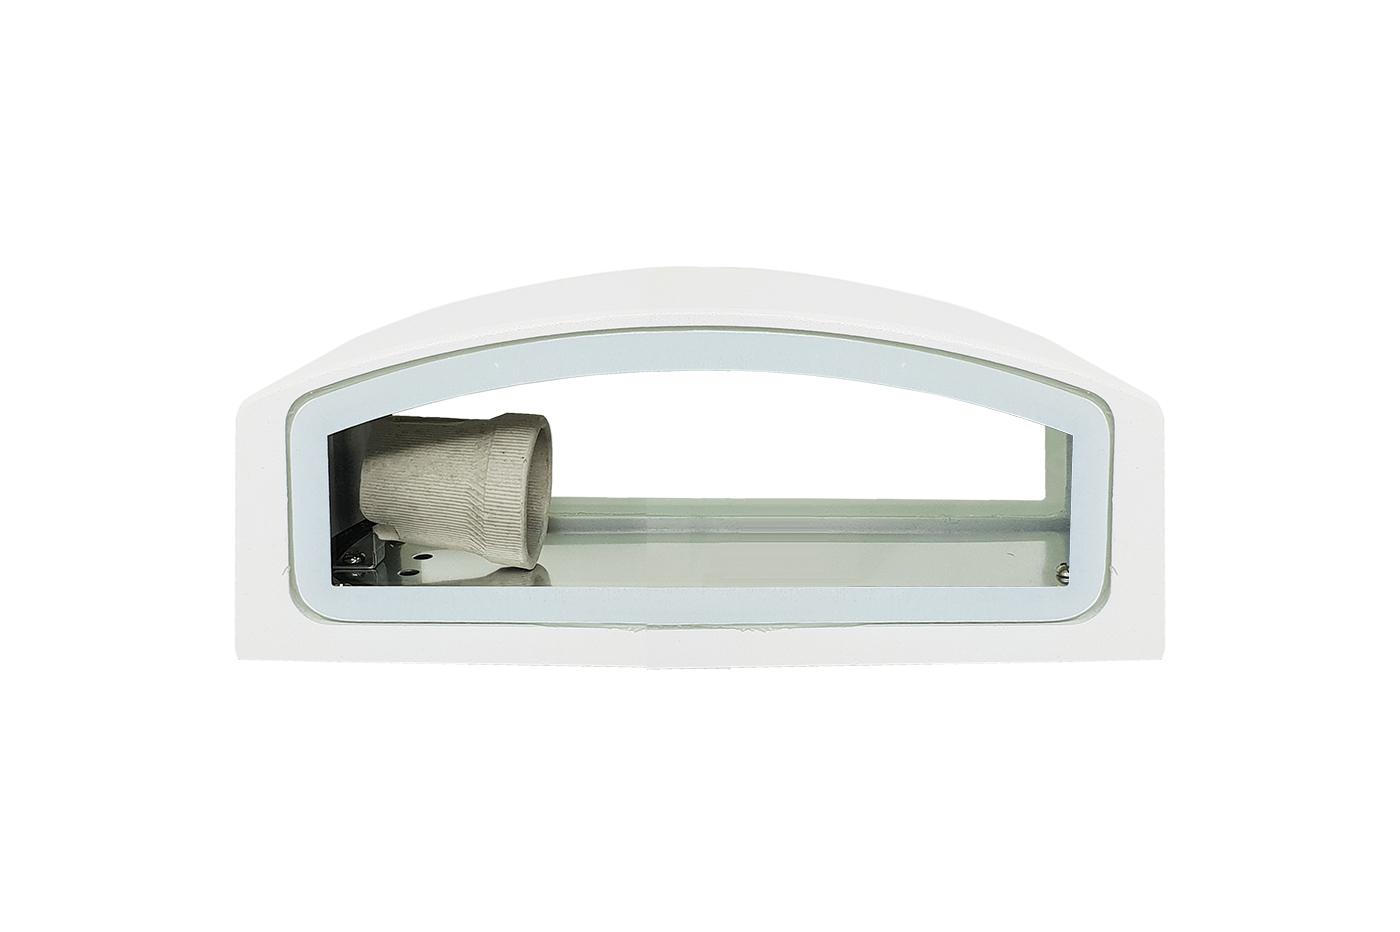 Applique esterno bianco vie lampada luce parete plafoniera